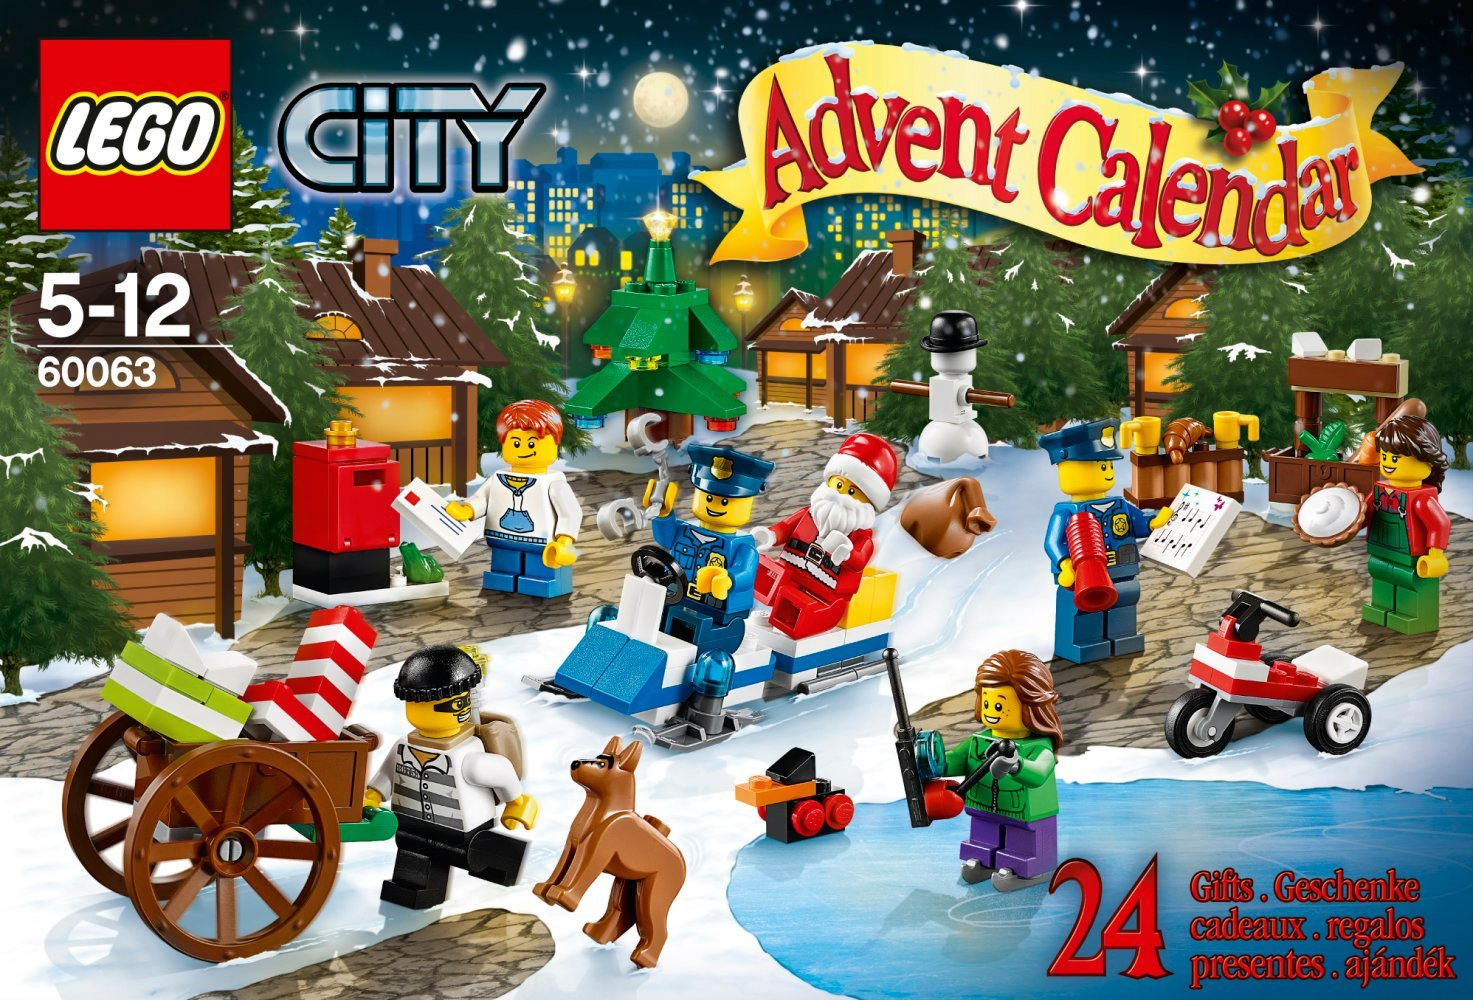 LEGO A Calendrier Avent City dp BIIYNLW